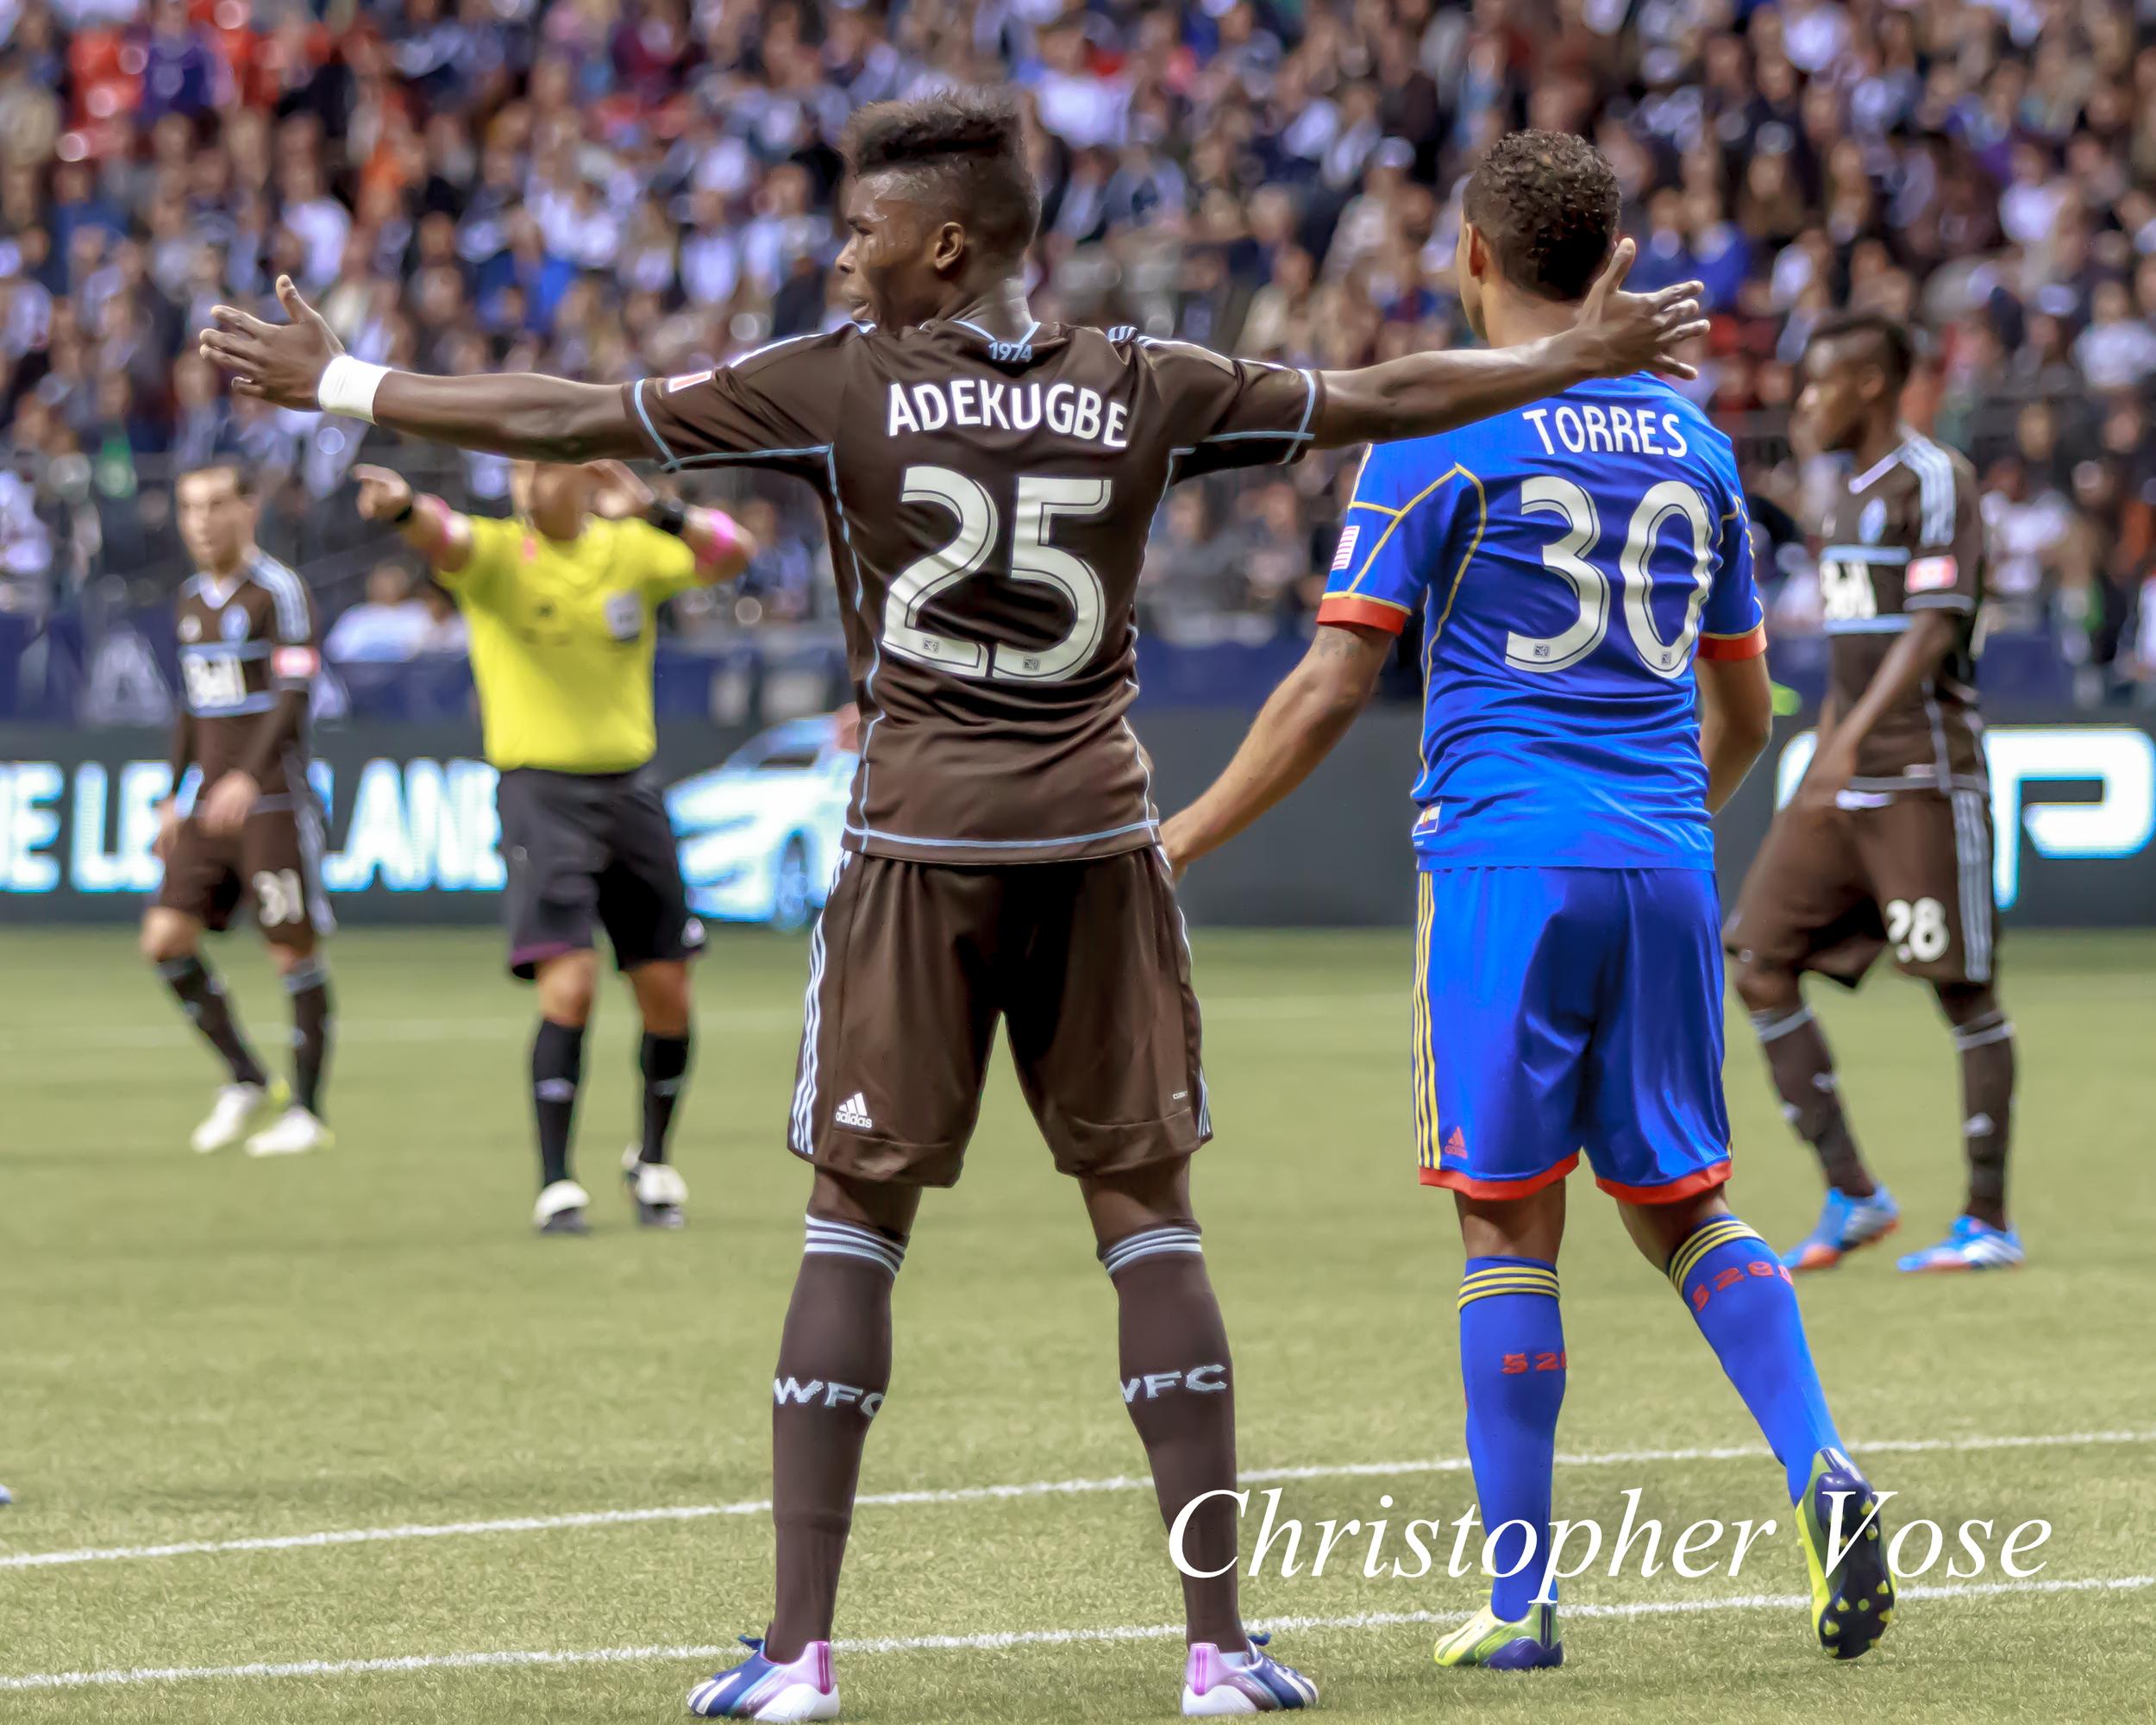 2013-10-27 Sam Adekugbe and Erick Torres.jpg